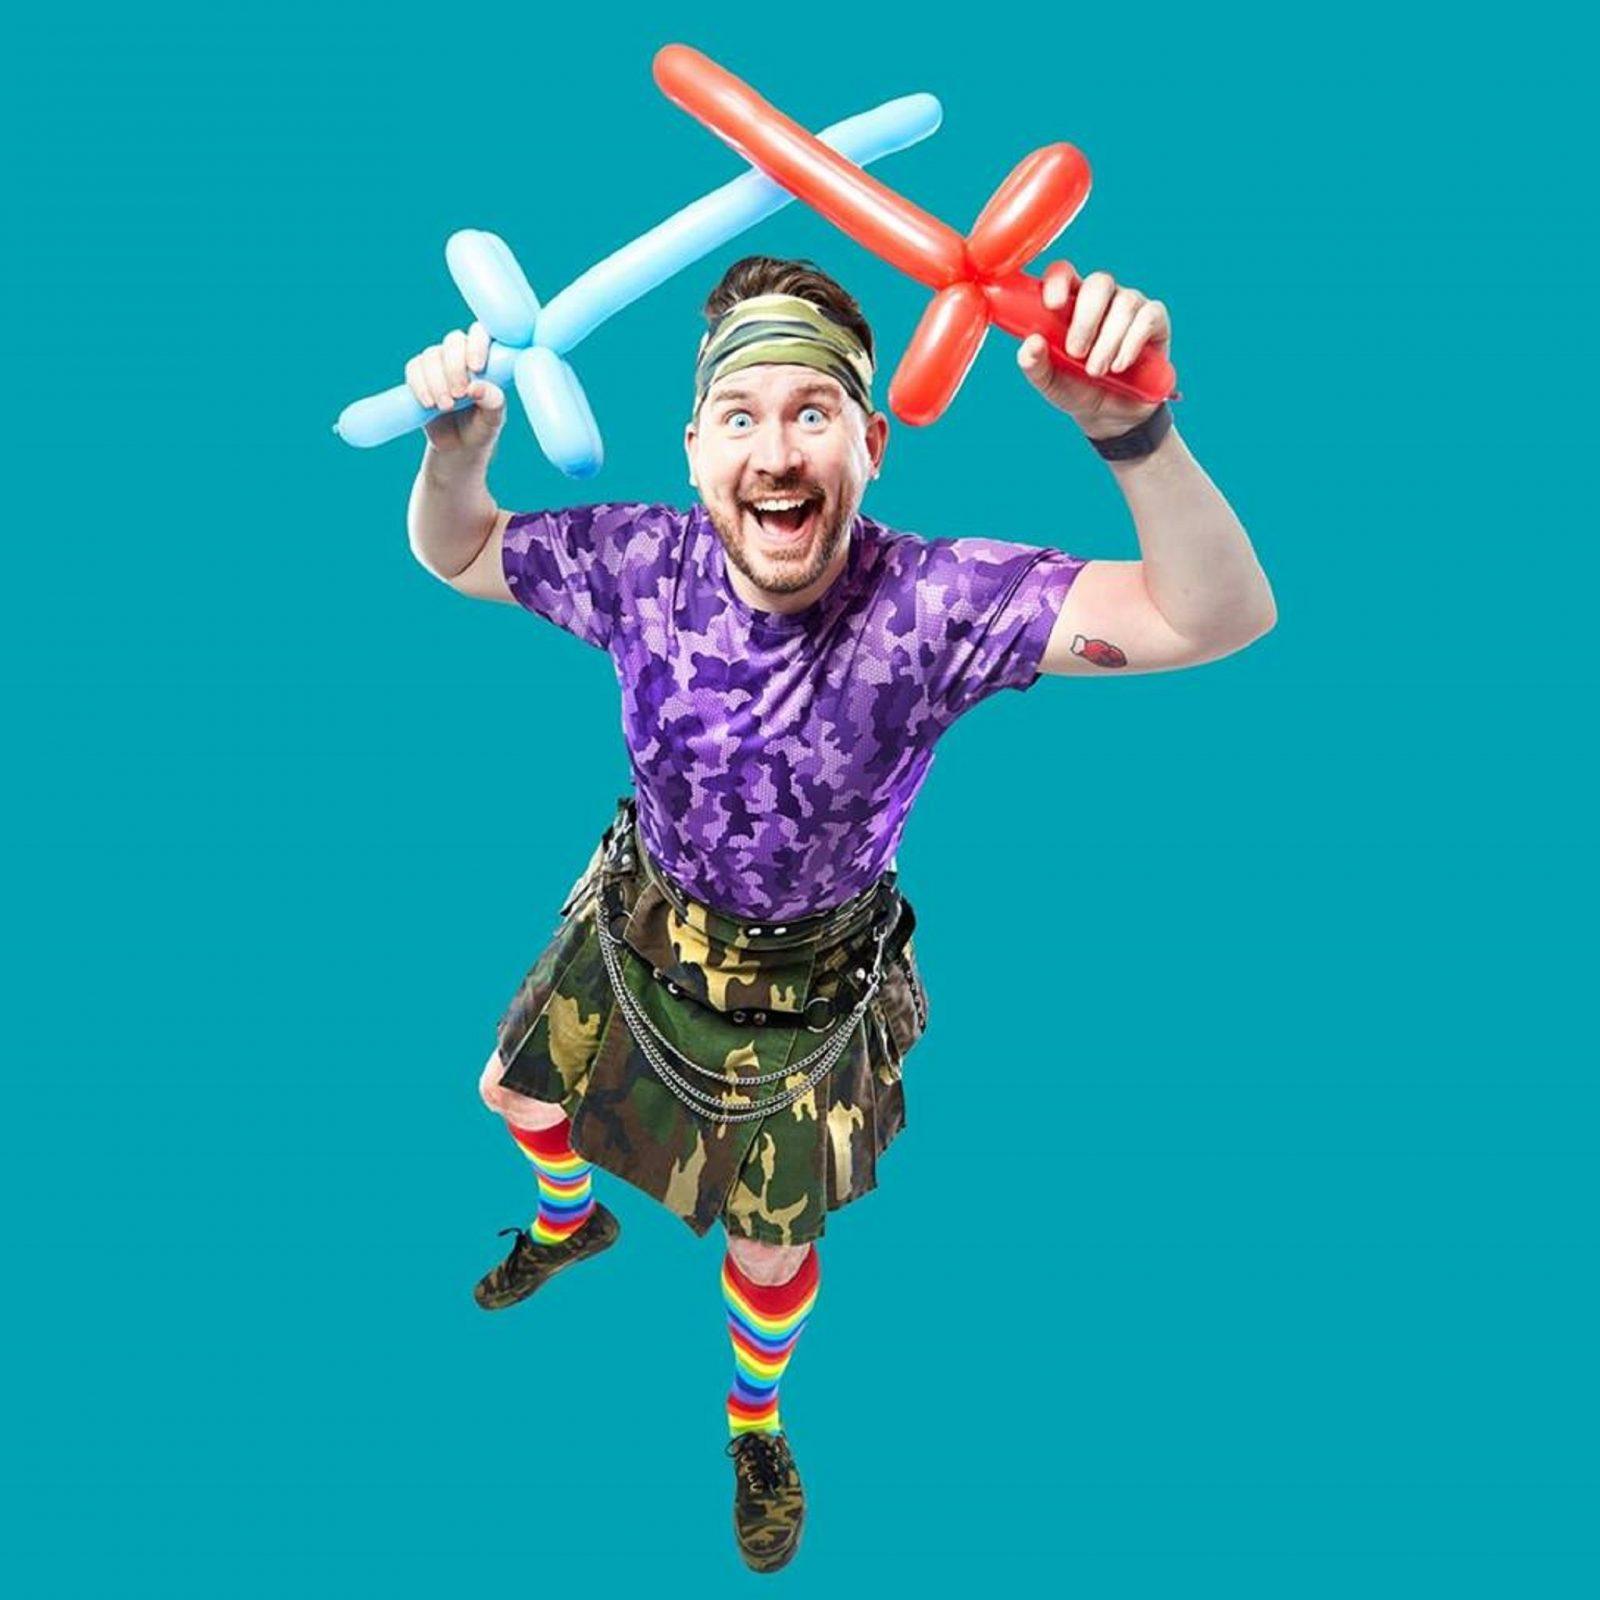 Ballonatics 2: Get Pumped - Fringe World, Perth, Western Australia